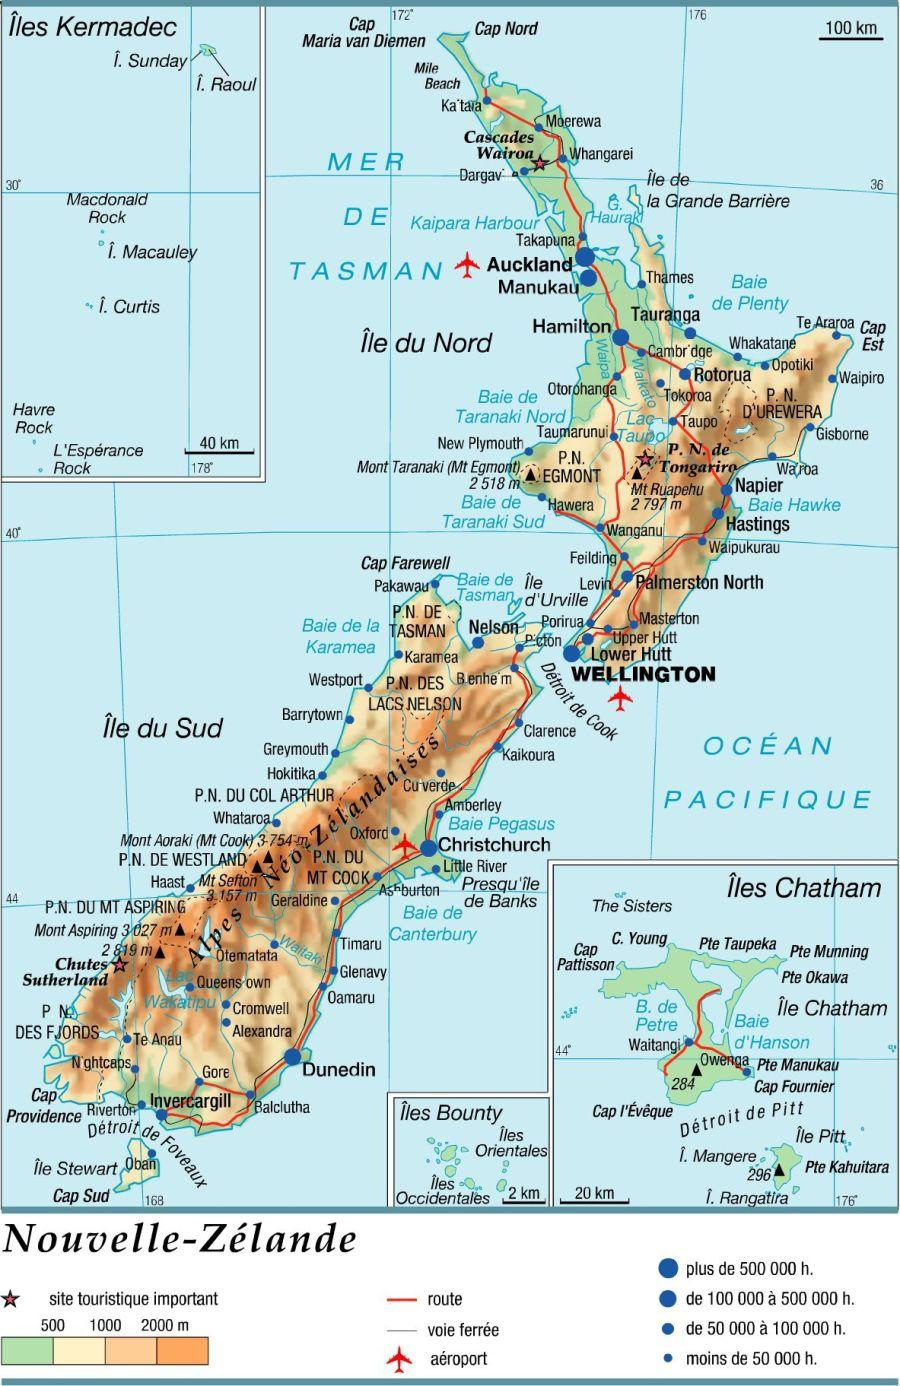 nouvelle zélende 1306116-Nouvelle-Zélande.HD